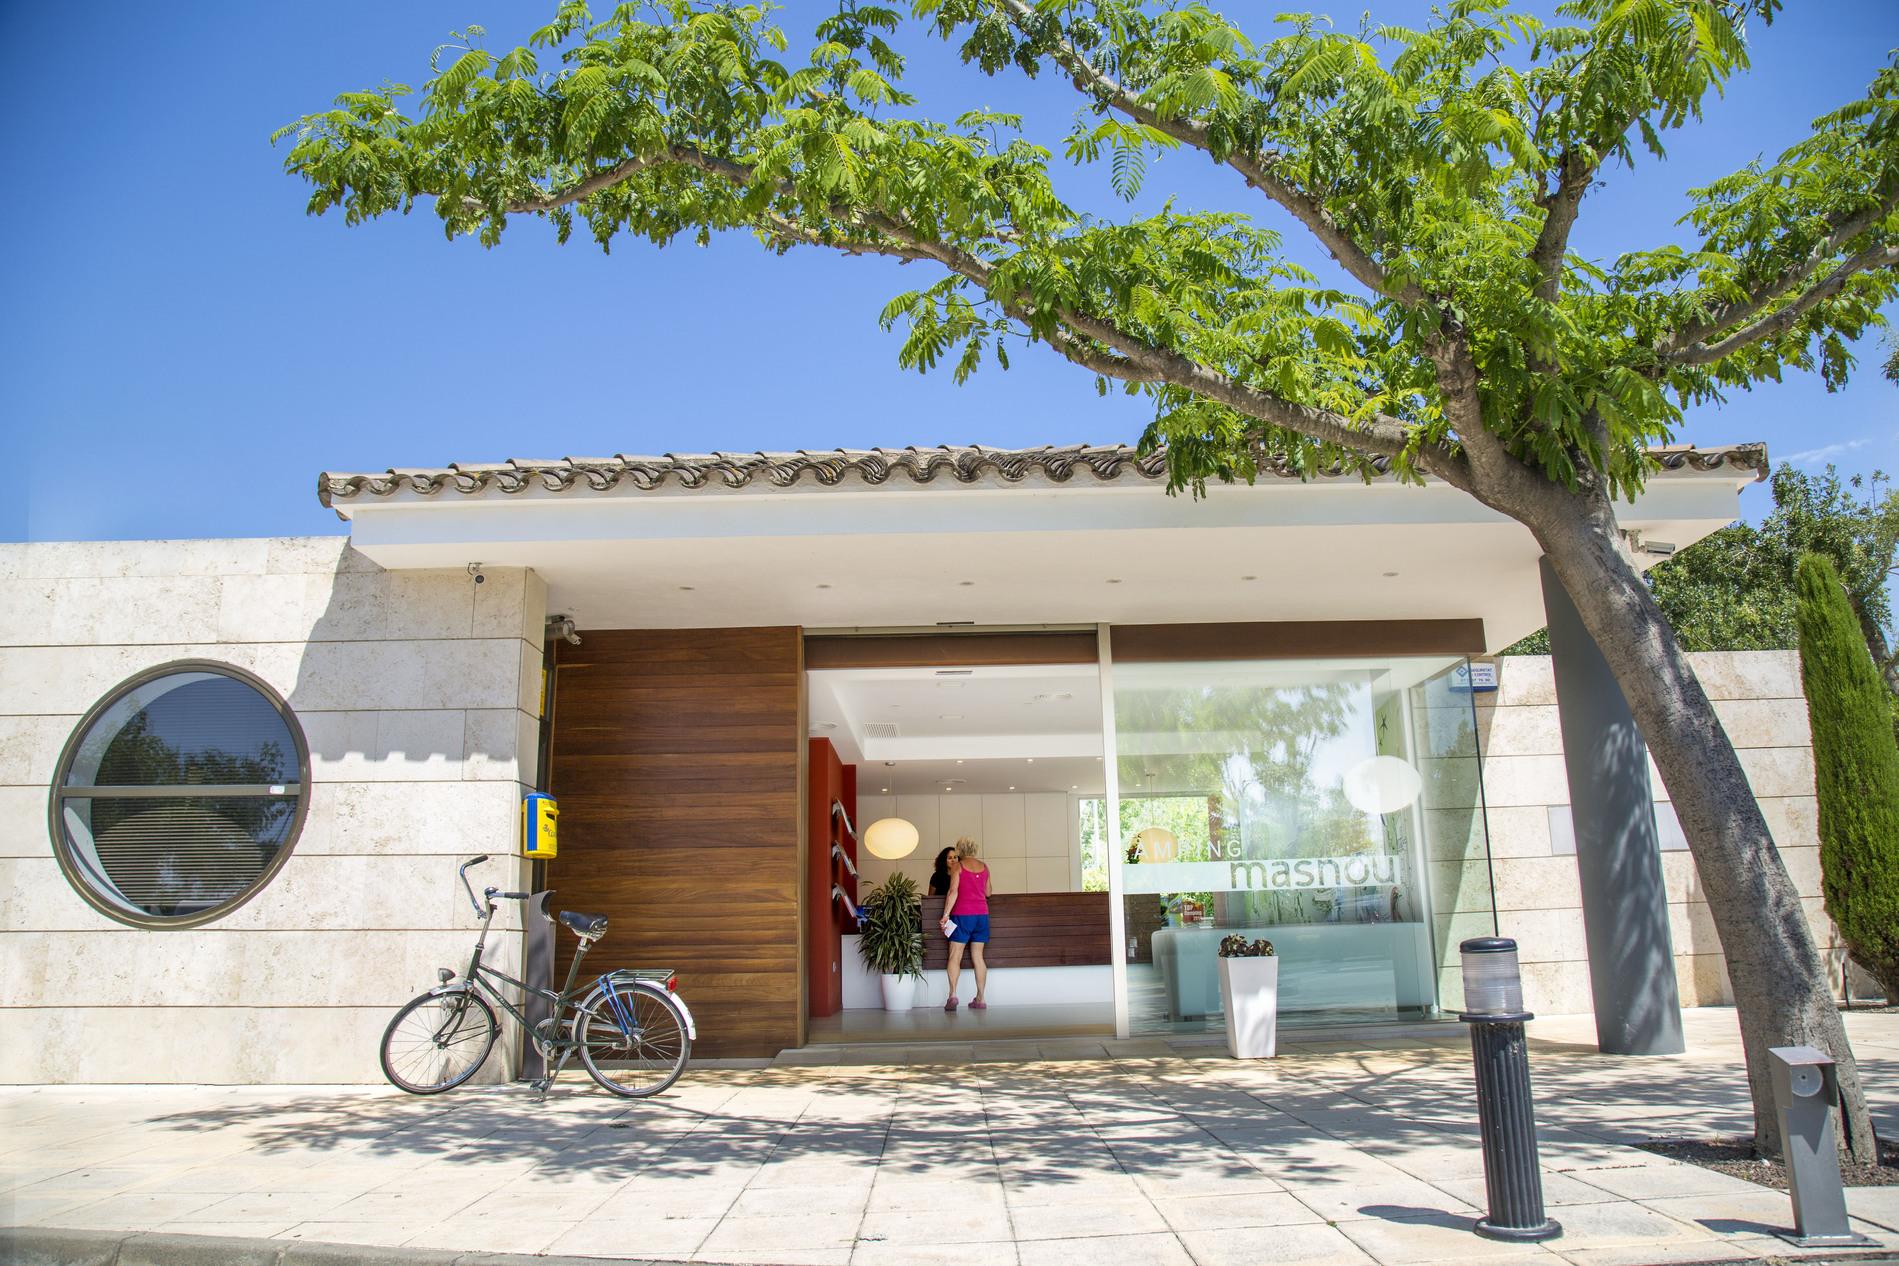 Spanje-Castello%20dEmpuries-Camping%20Mas%20Nou-ExtraLarge Campings Spanje